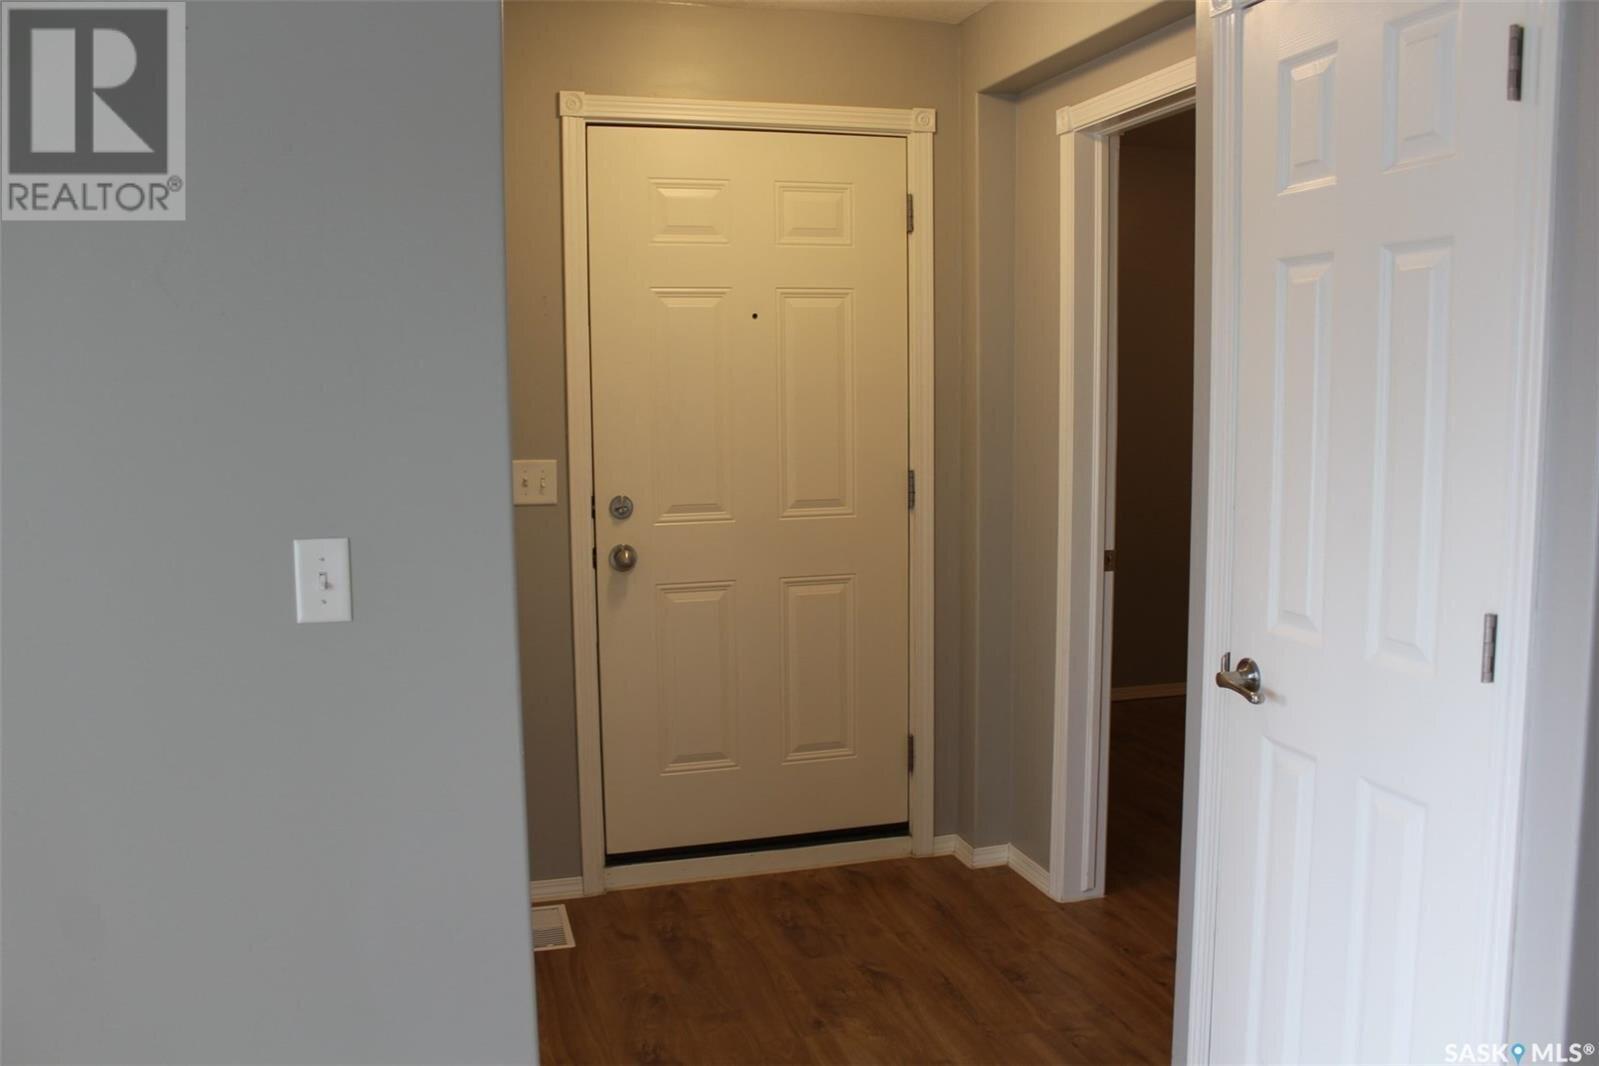 Condo for sale at 485 1st Ave NW Unit 30 Weyburn Saskatchewan - MLS: SK839193